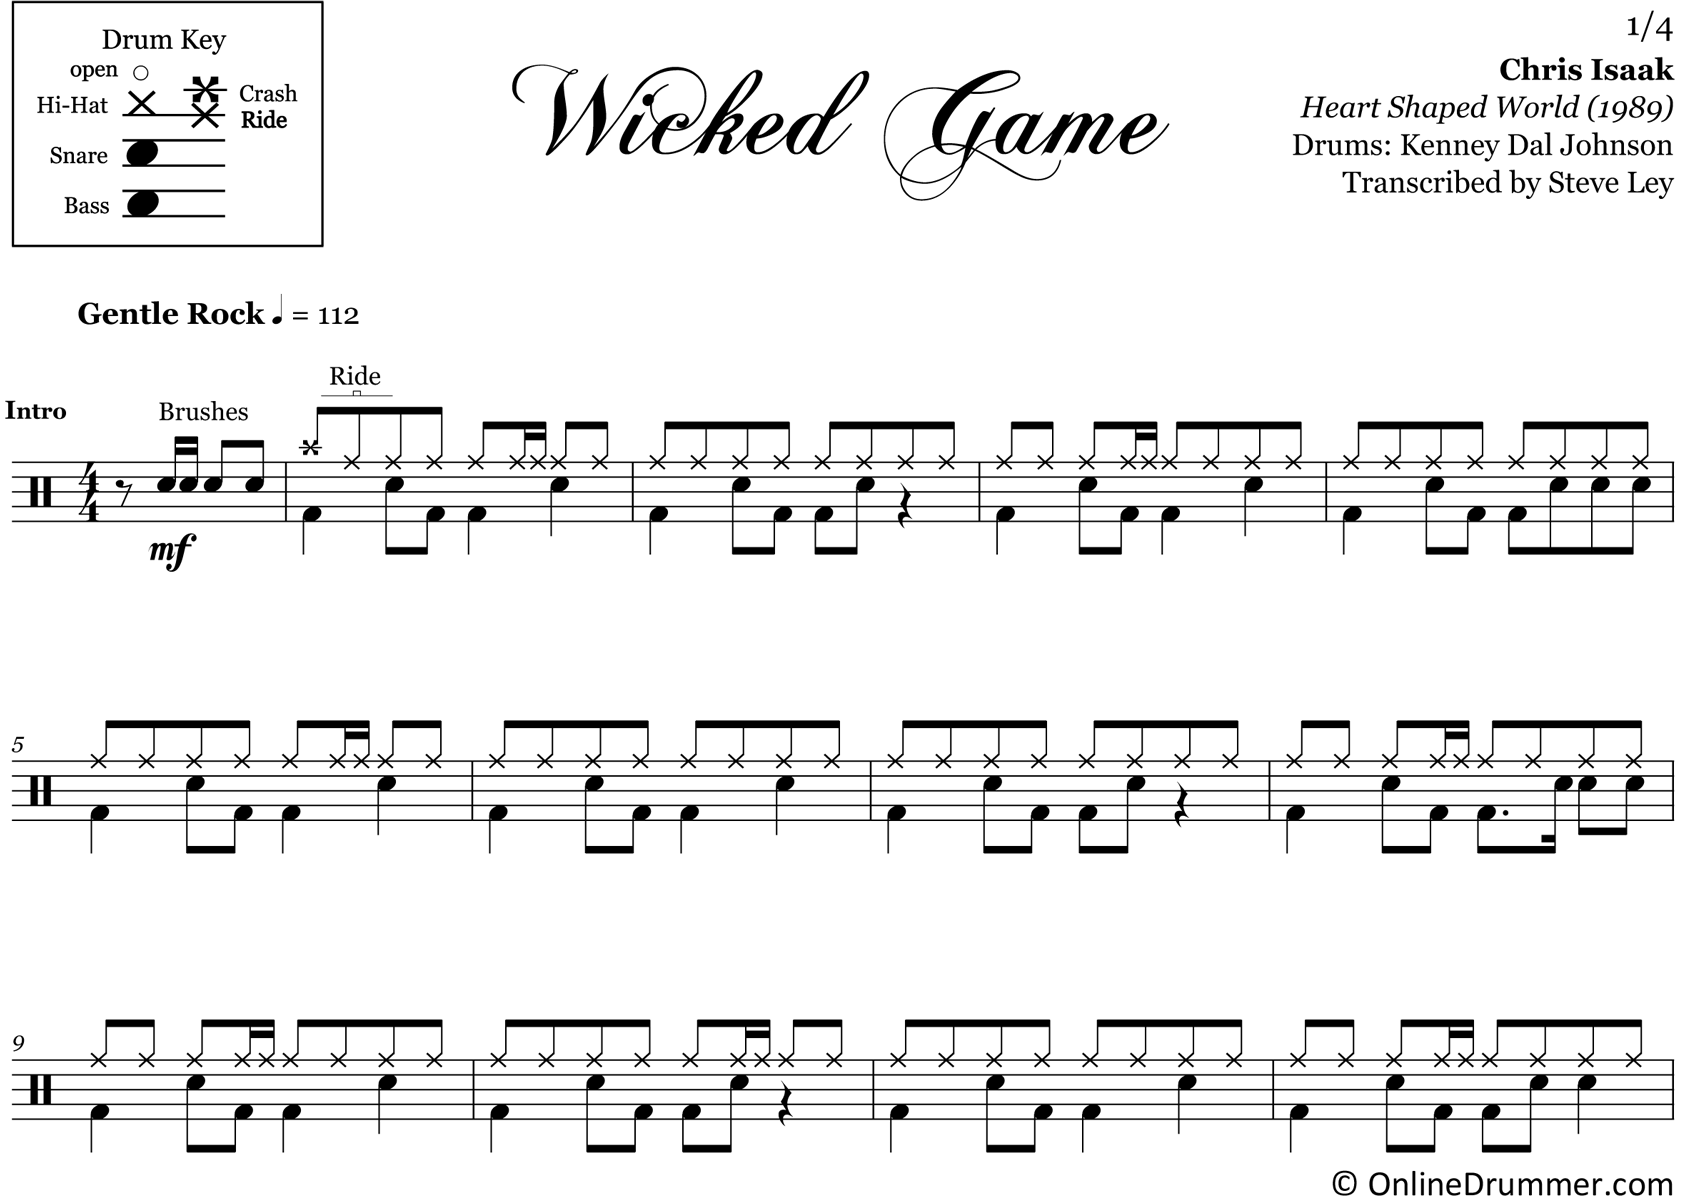 Wicked Game - Chris Isaak - Drum Sheet Music